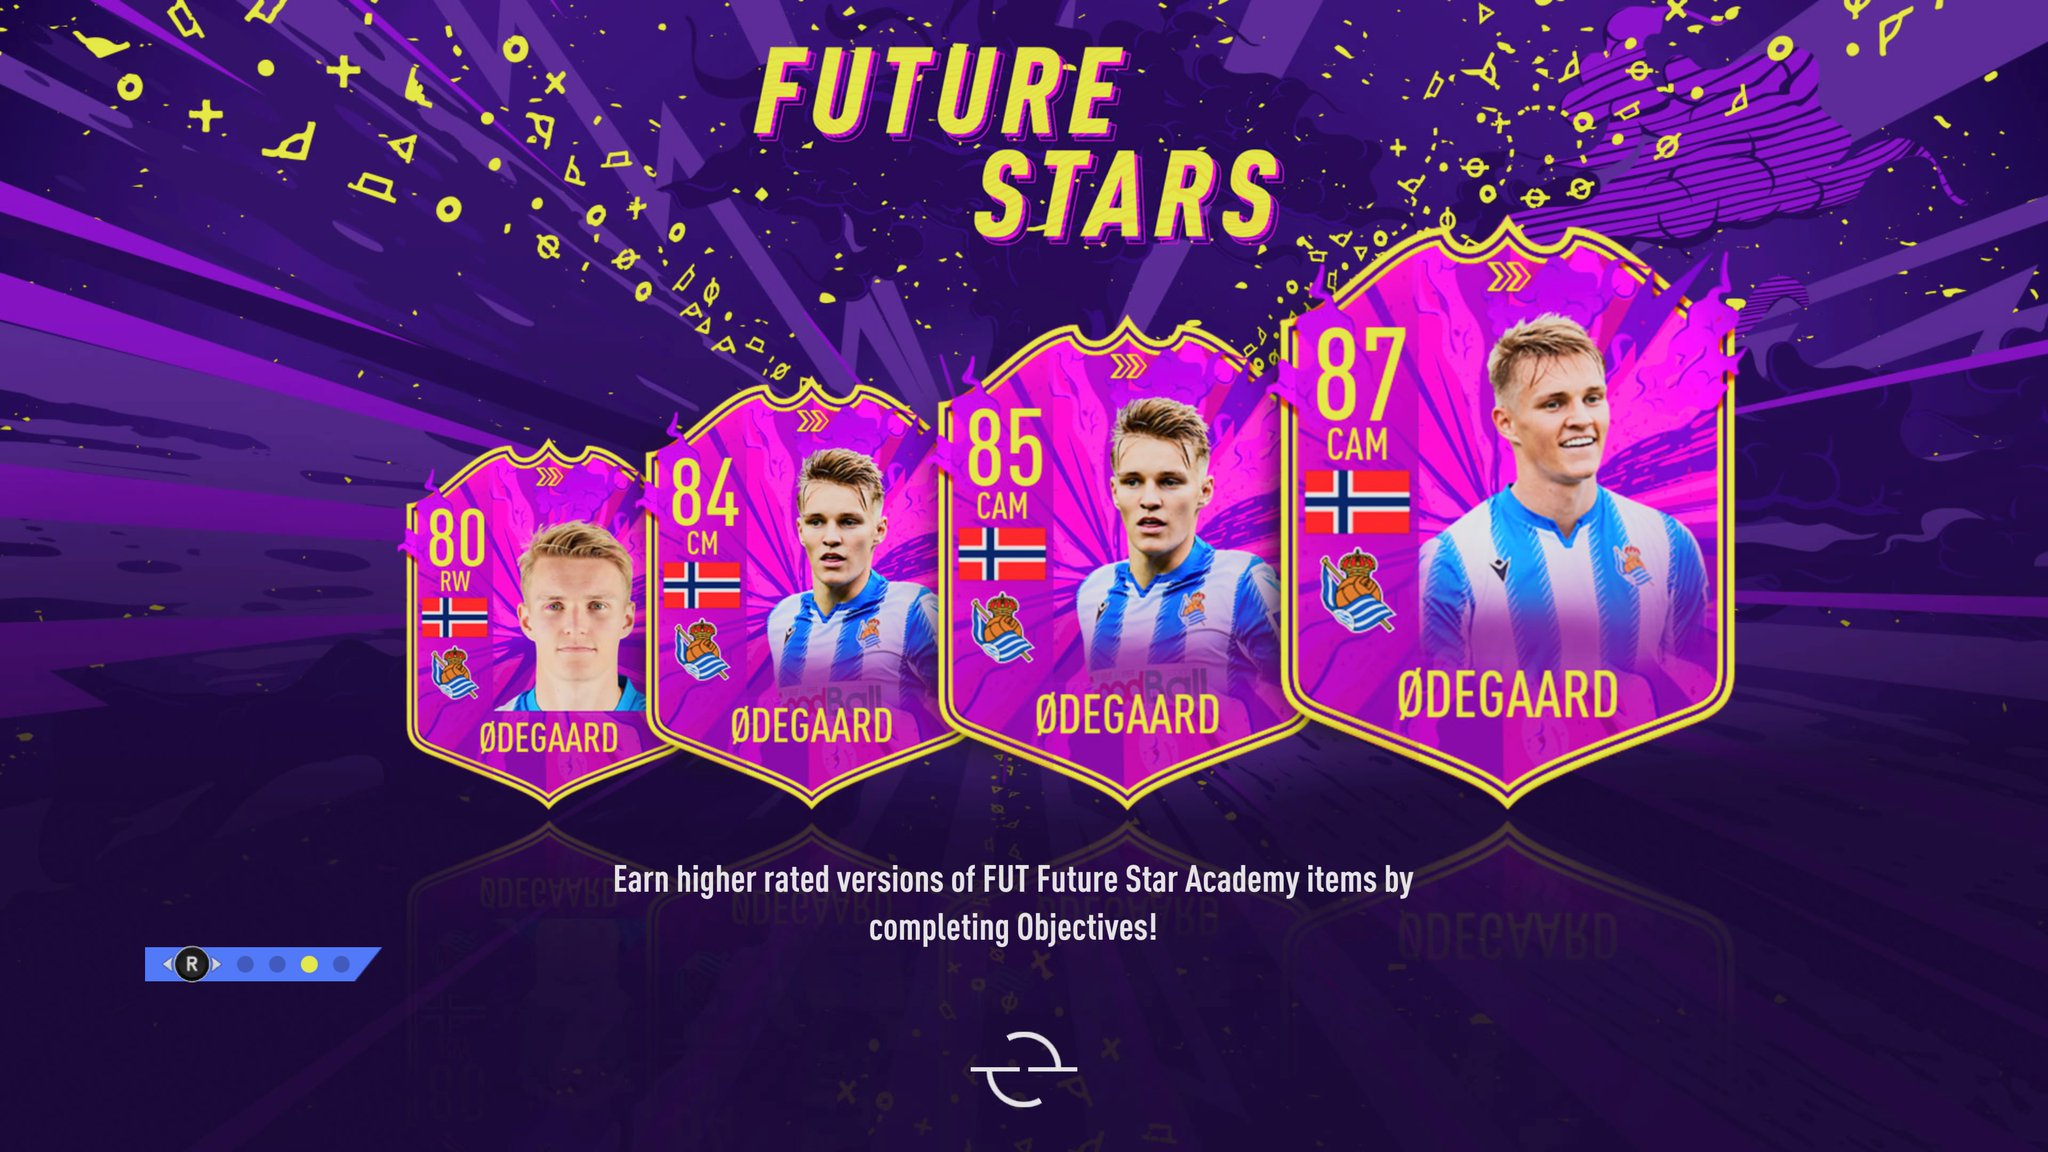 Odegaard Future Stars Academy